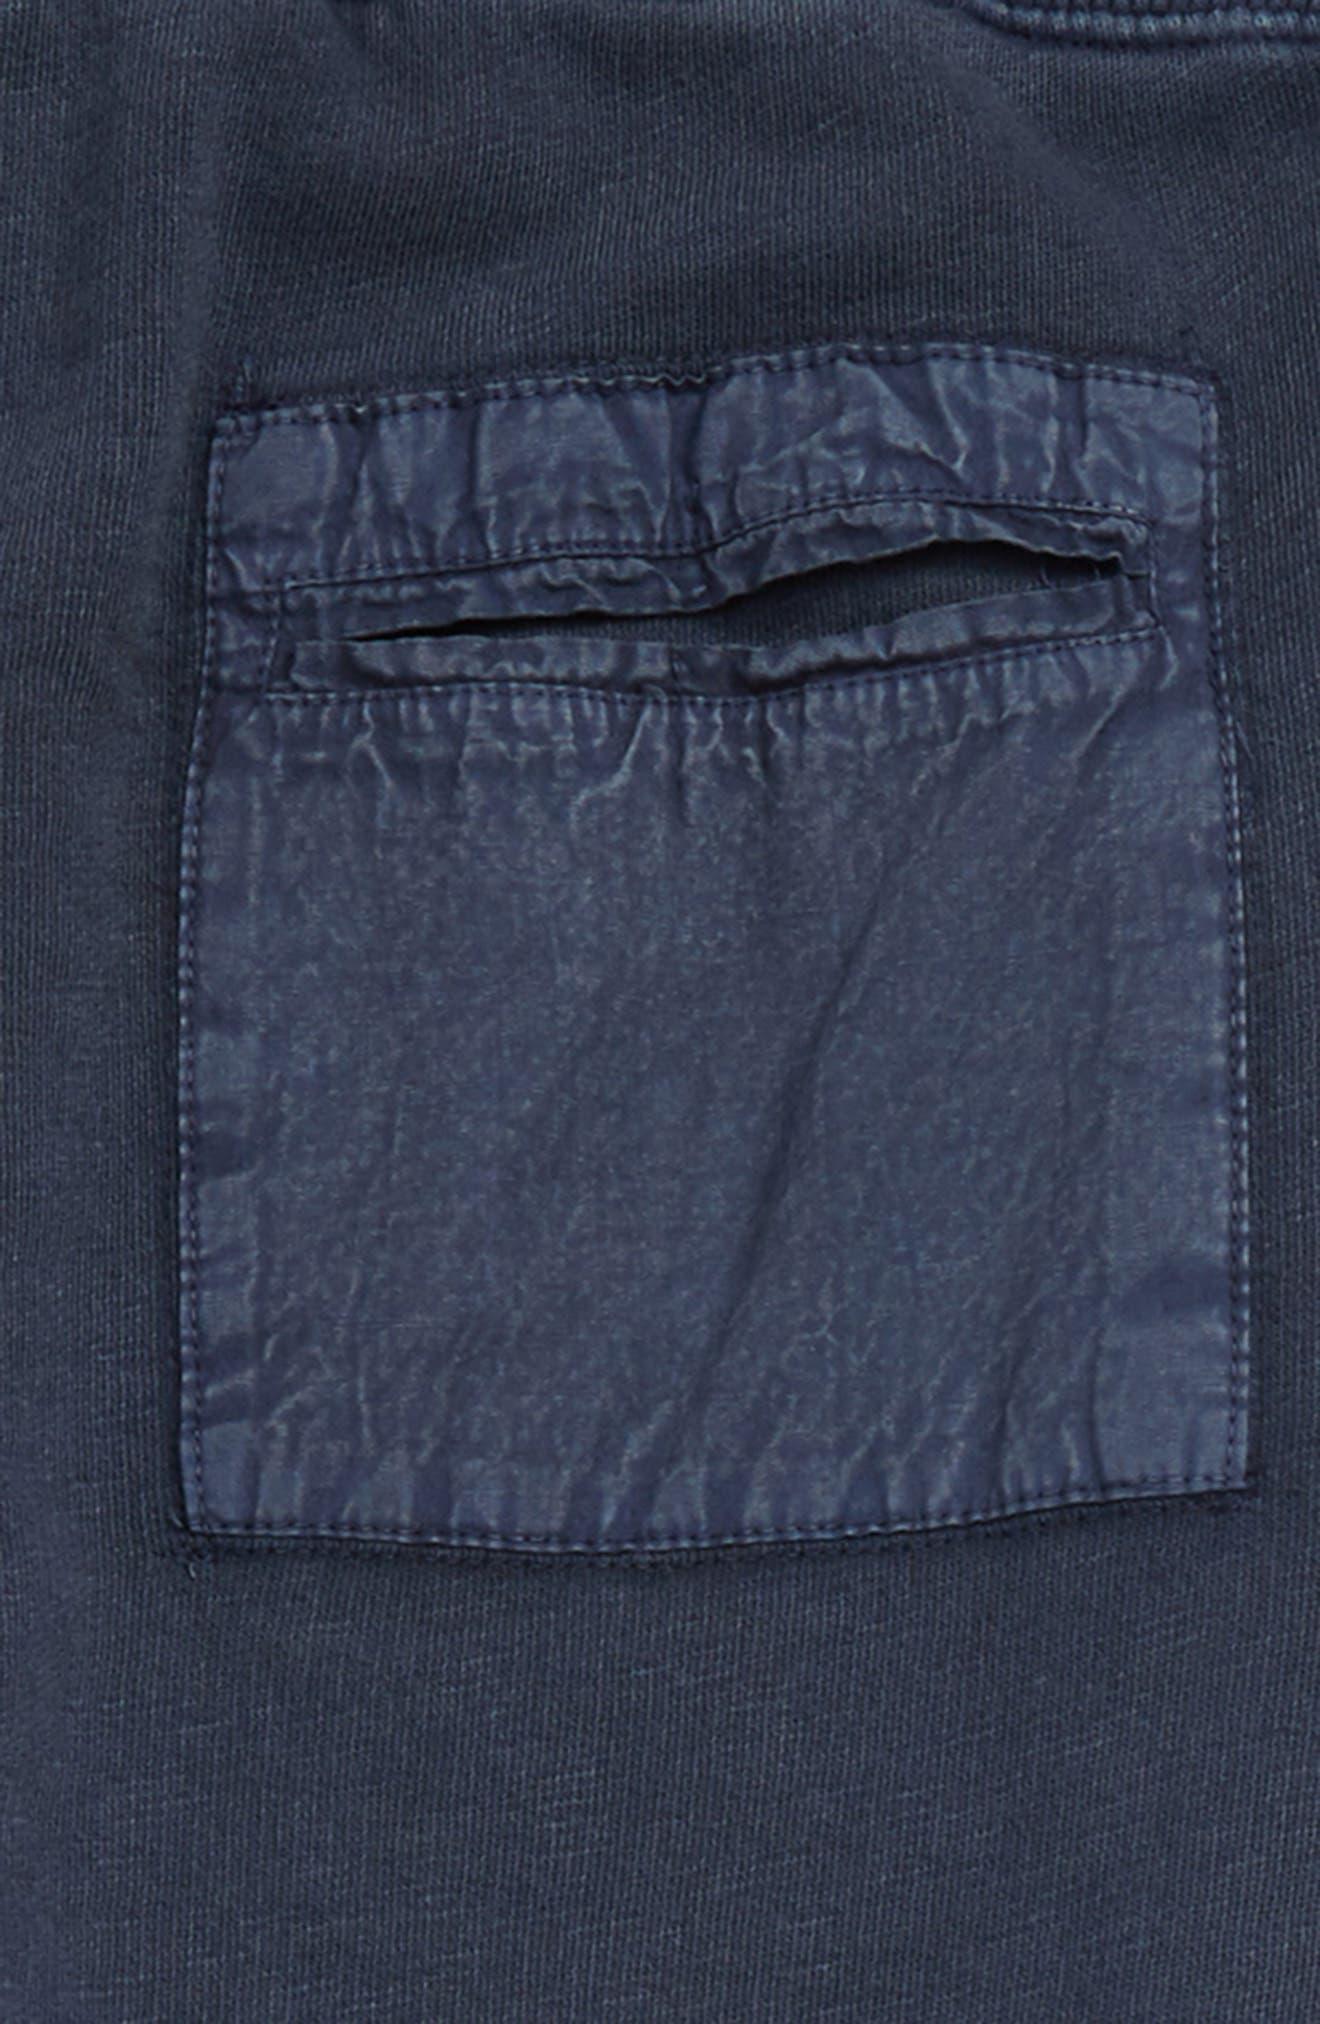 Jogger Pants,                             Alternate thumbnail 3, color,                             NAVY INDIA INK